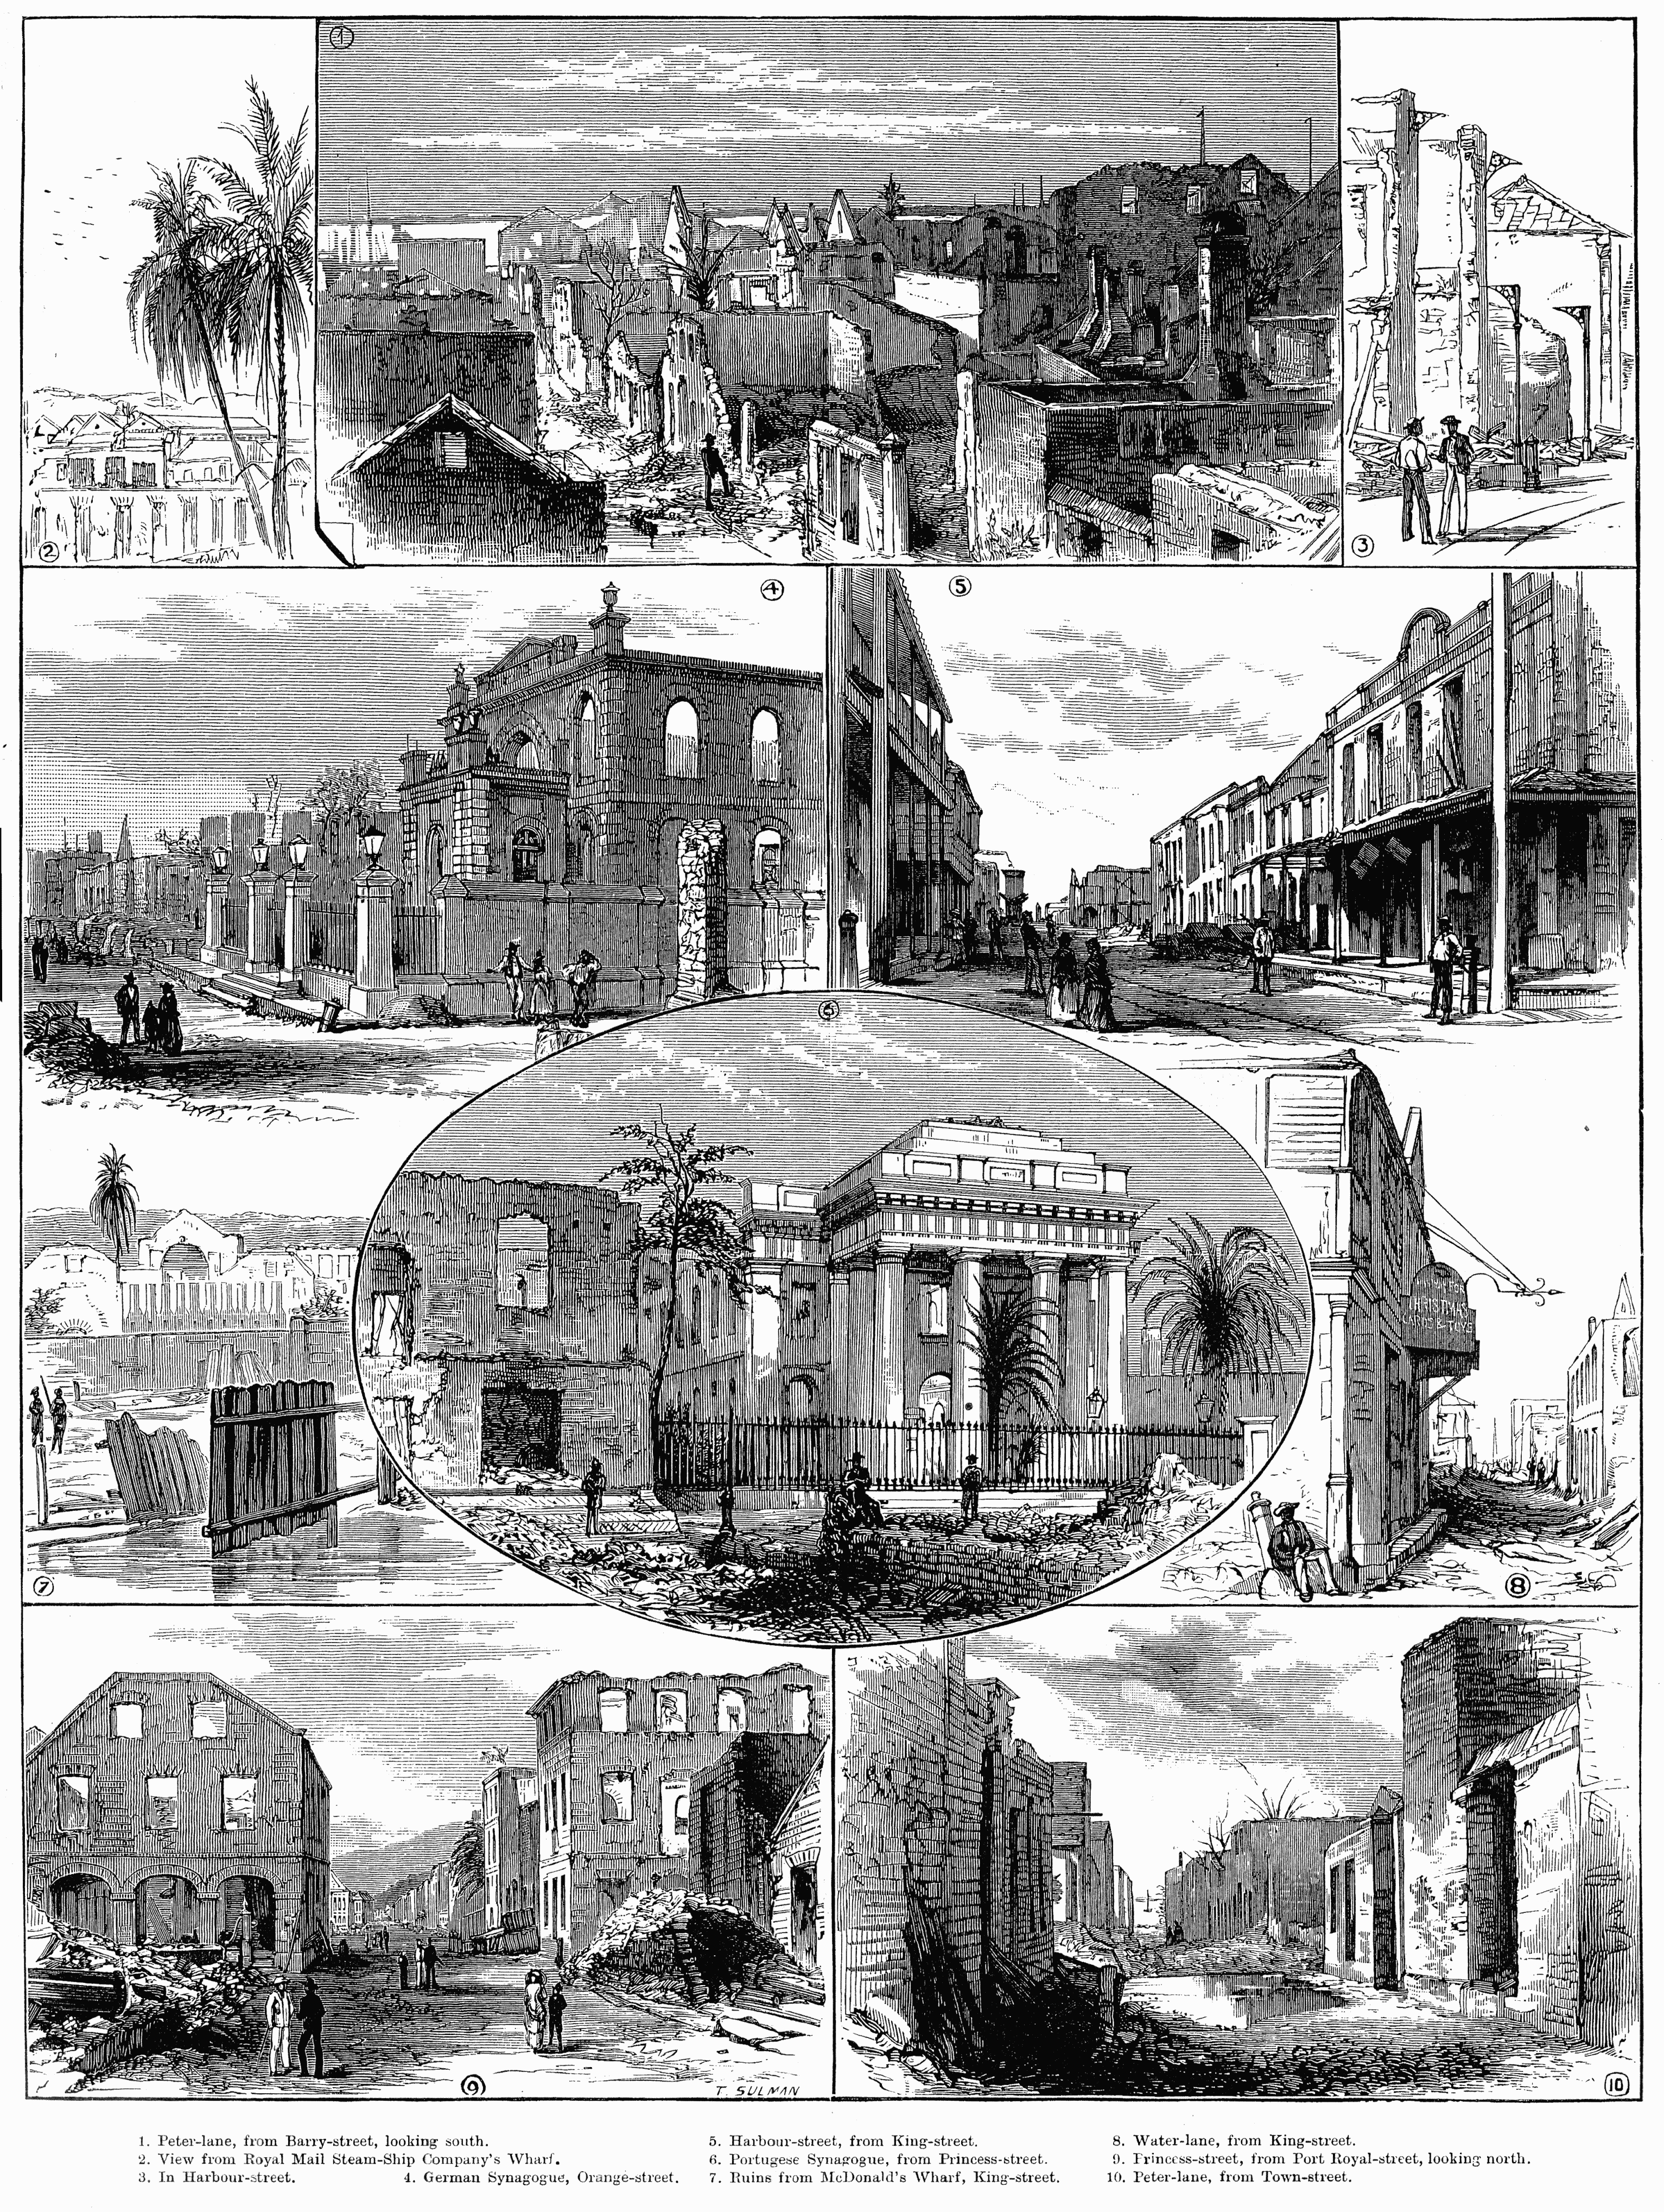 Depiction of Kingston